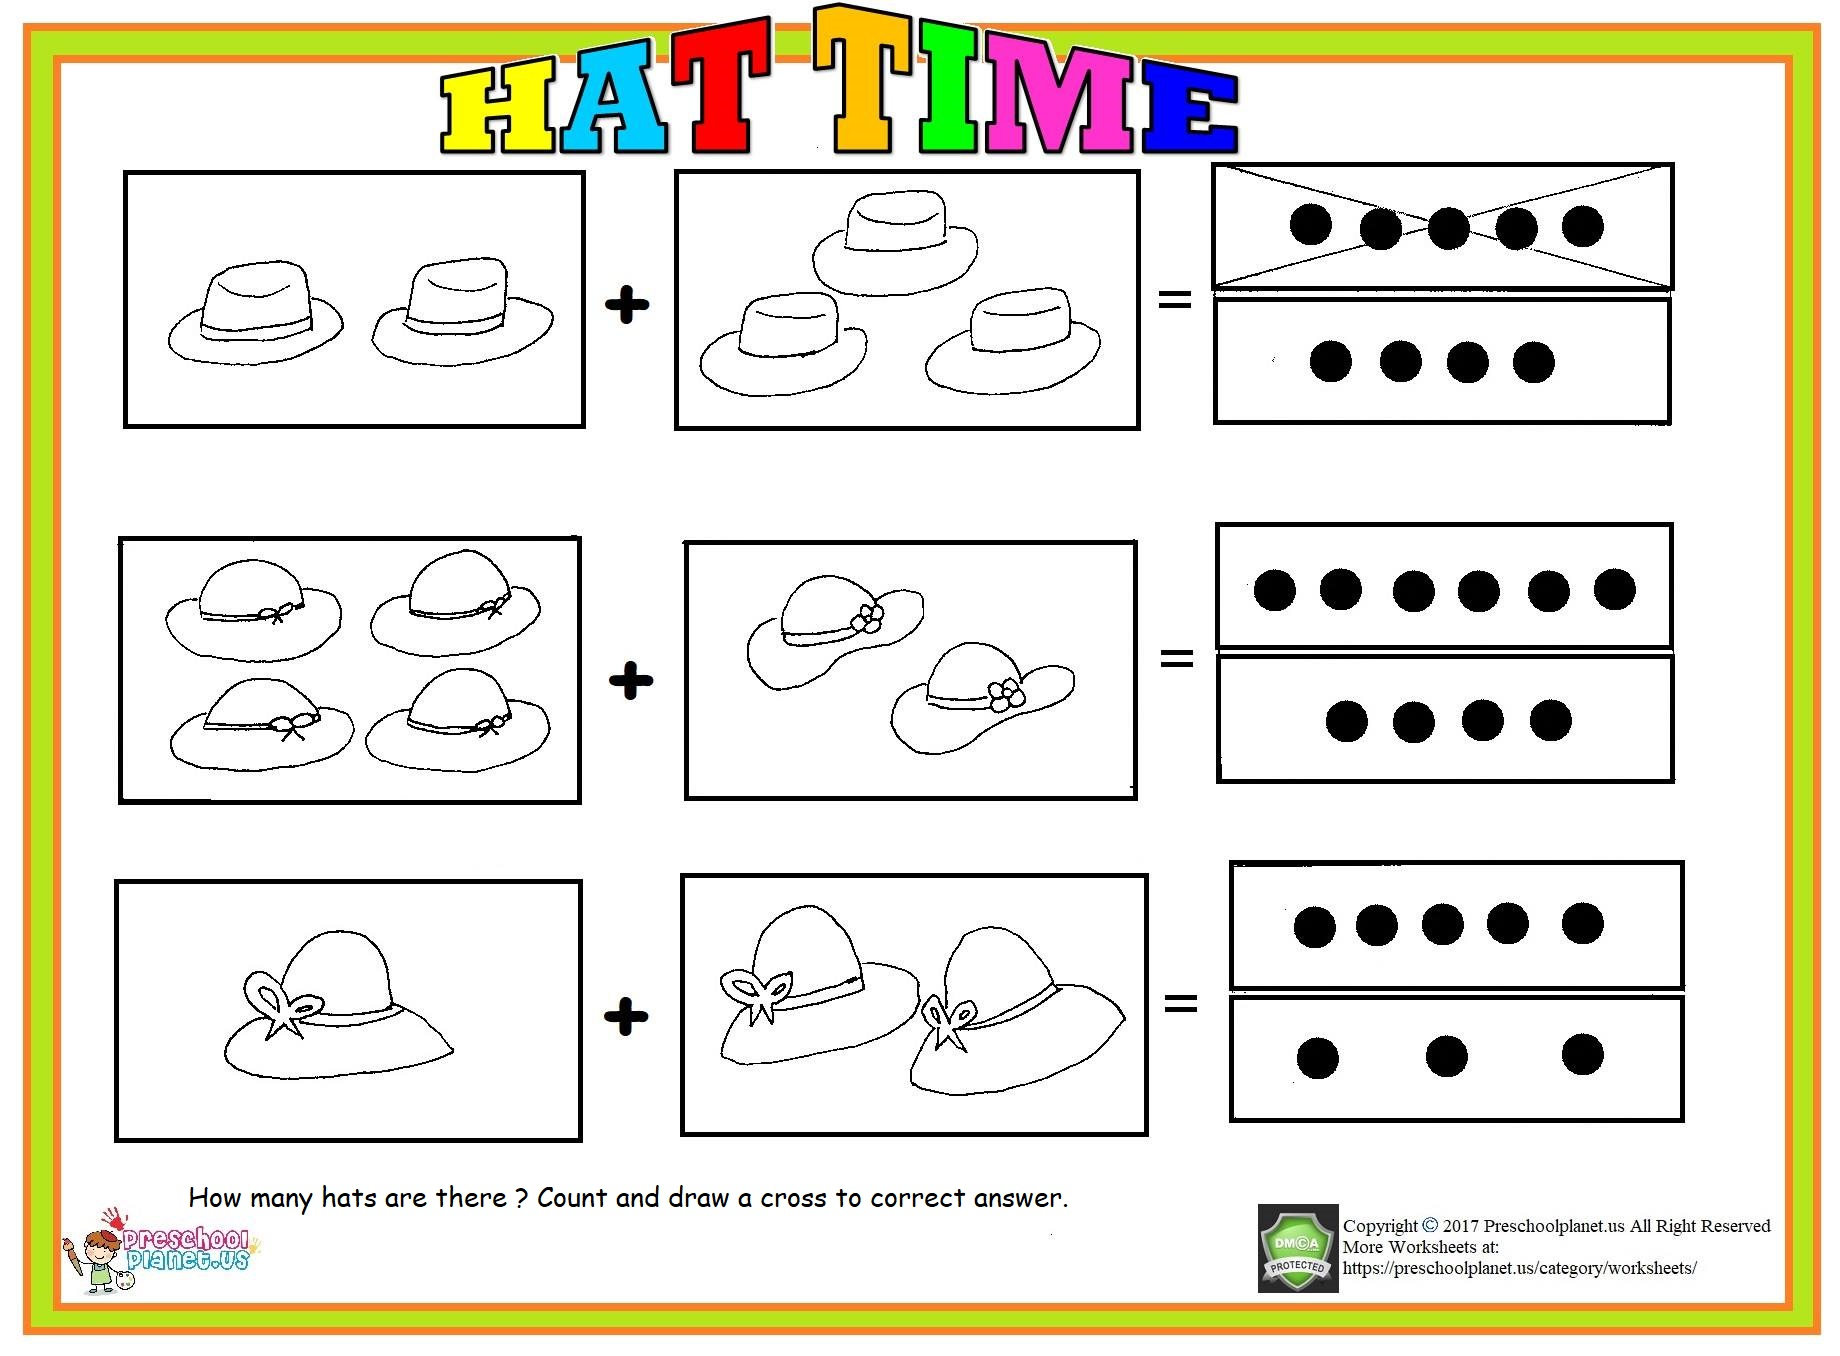 Math Worksheet Page 4 Preschoolplanet